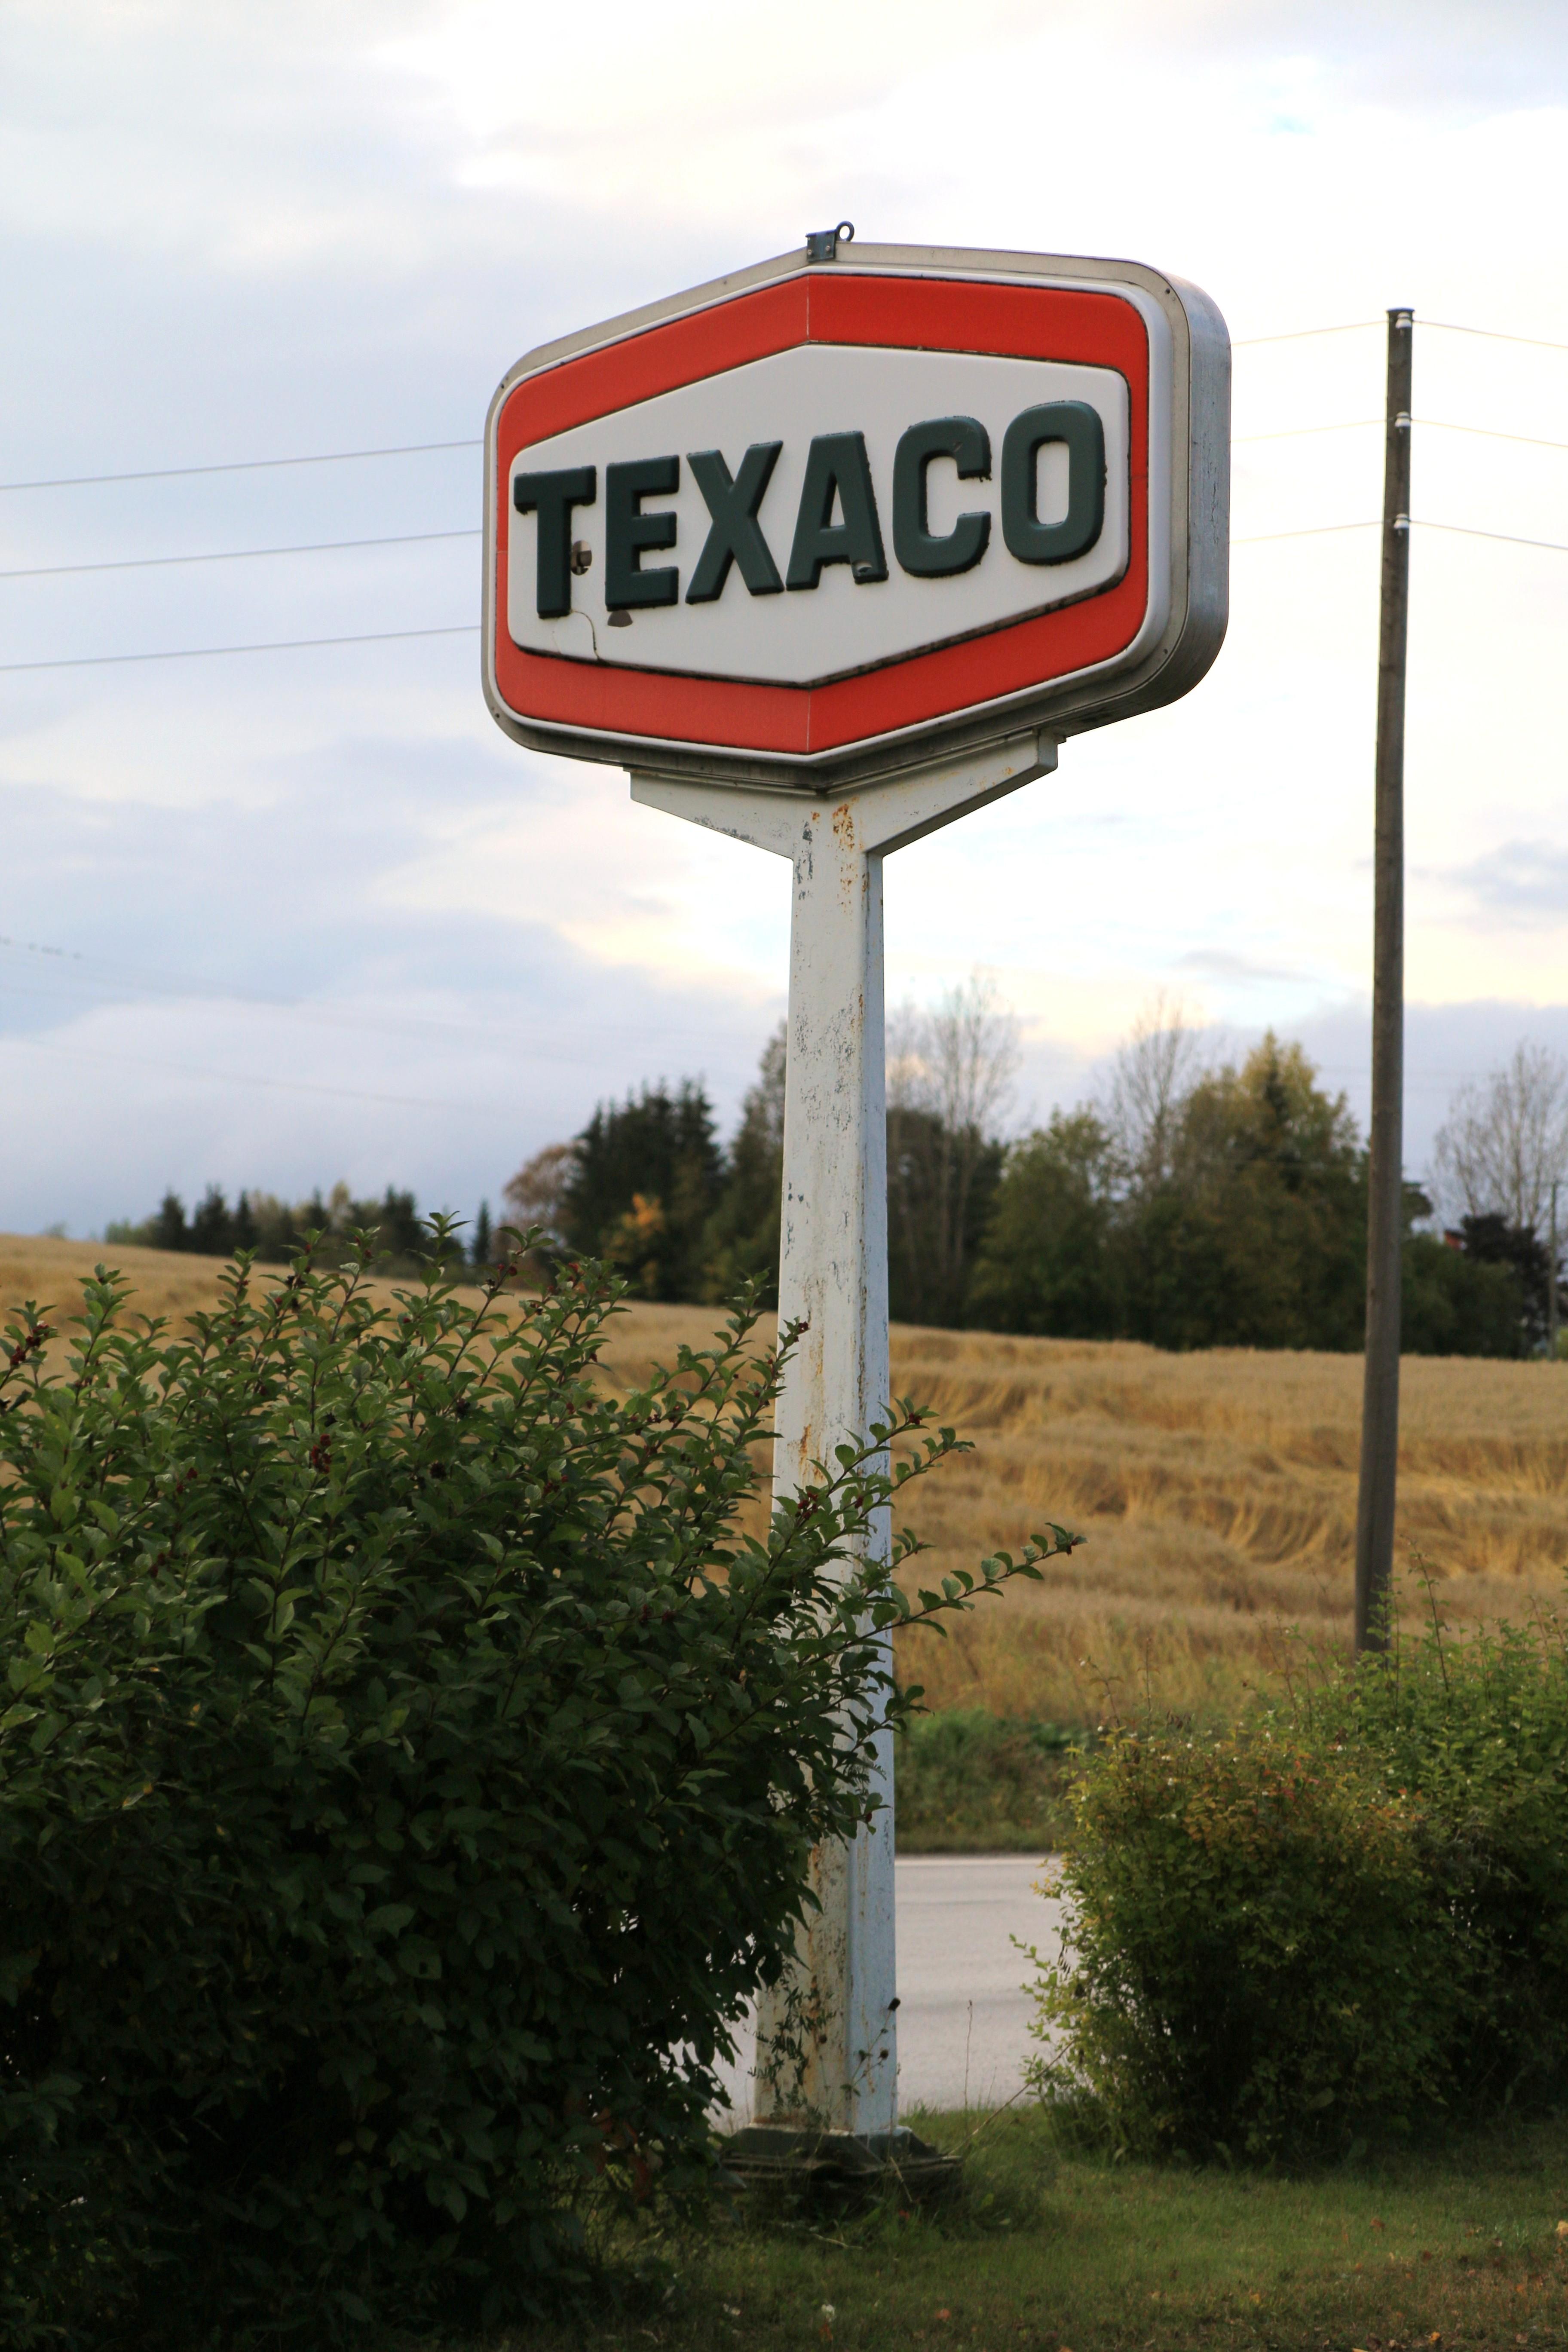 File:Old Texaco gas station sign at Kolbu in Norway 2 JPG